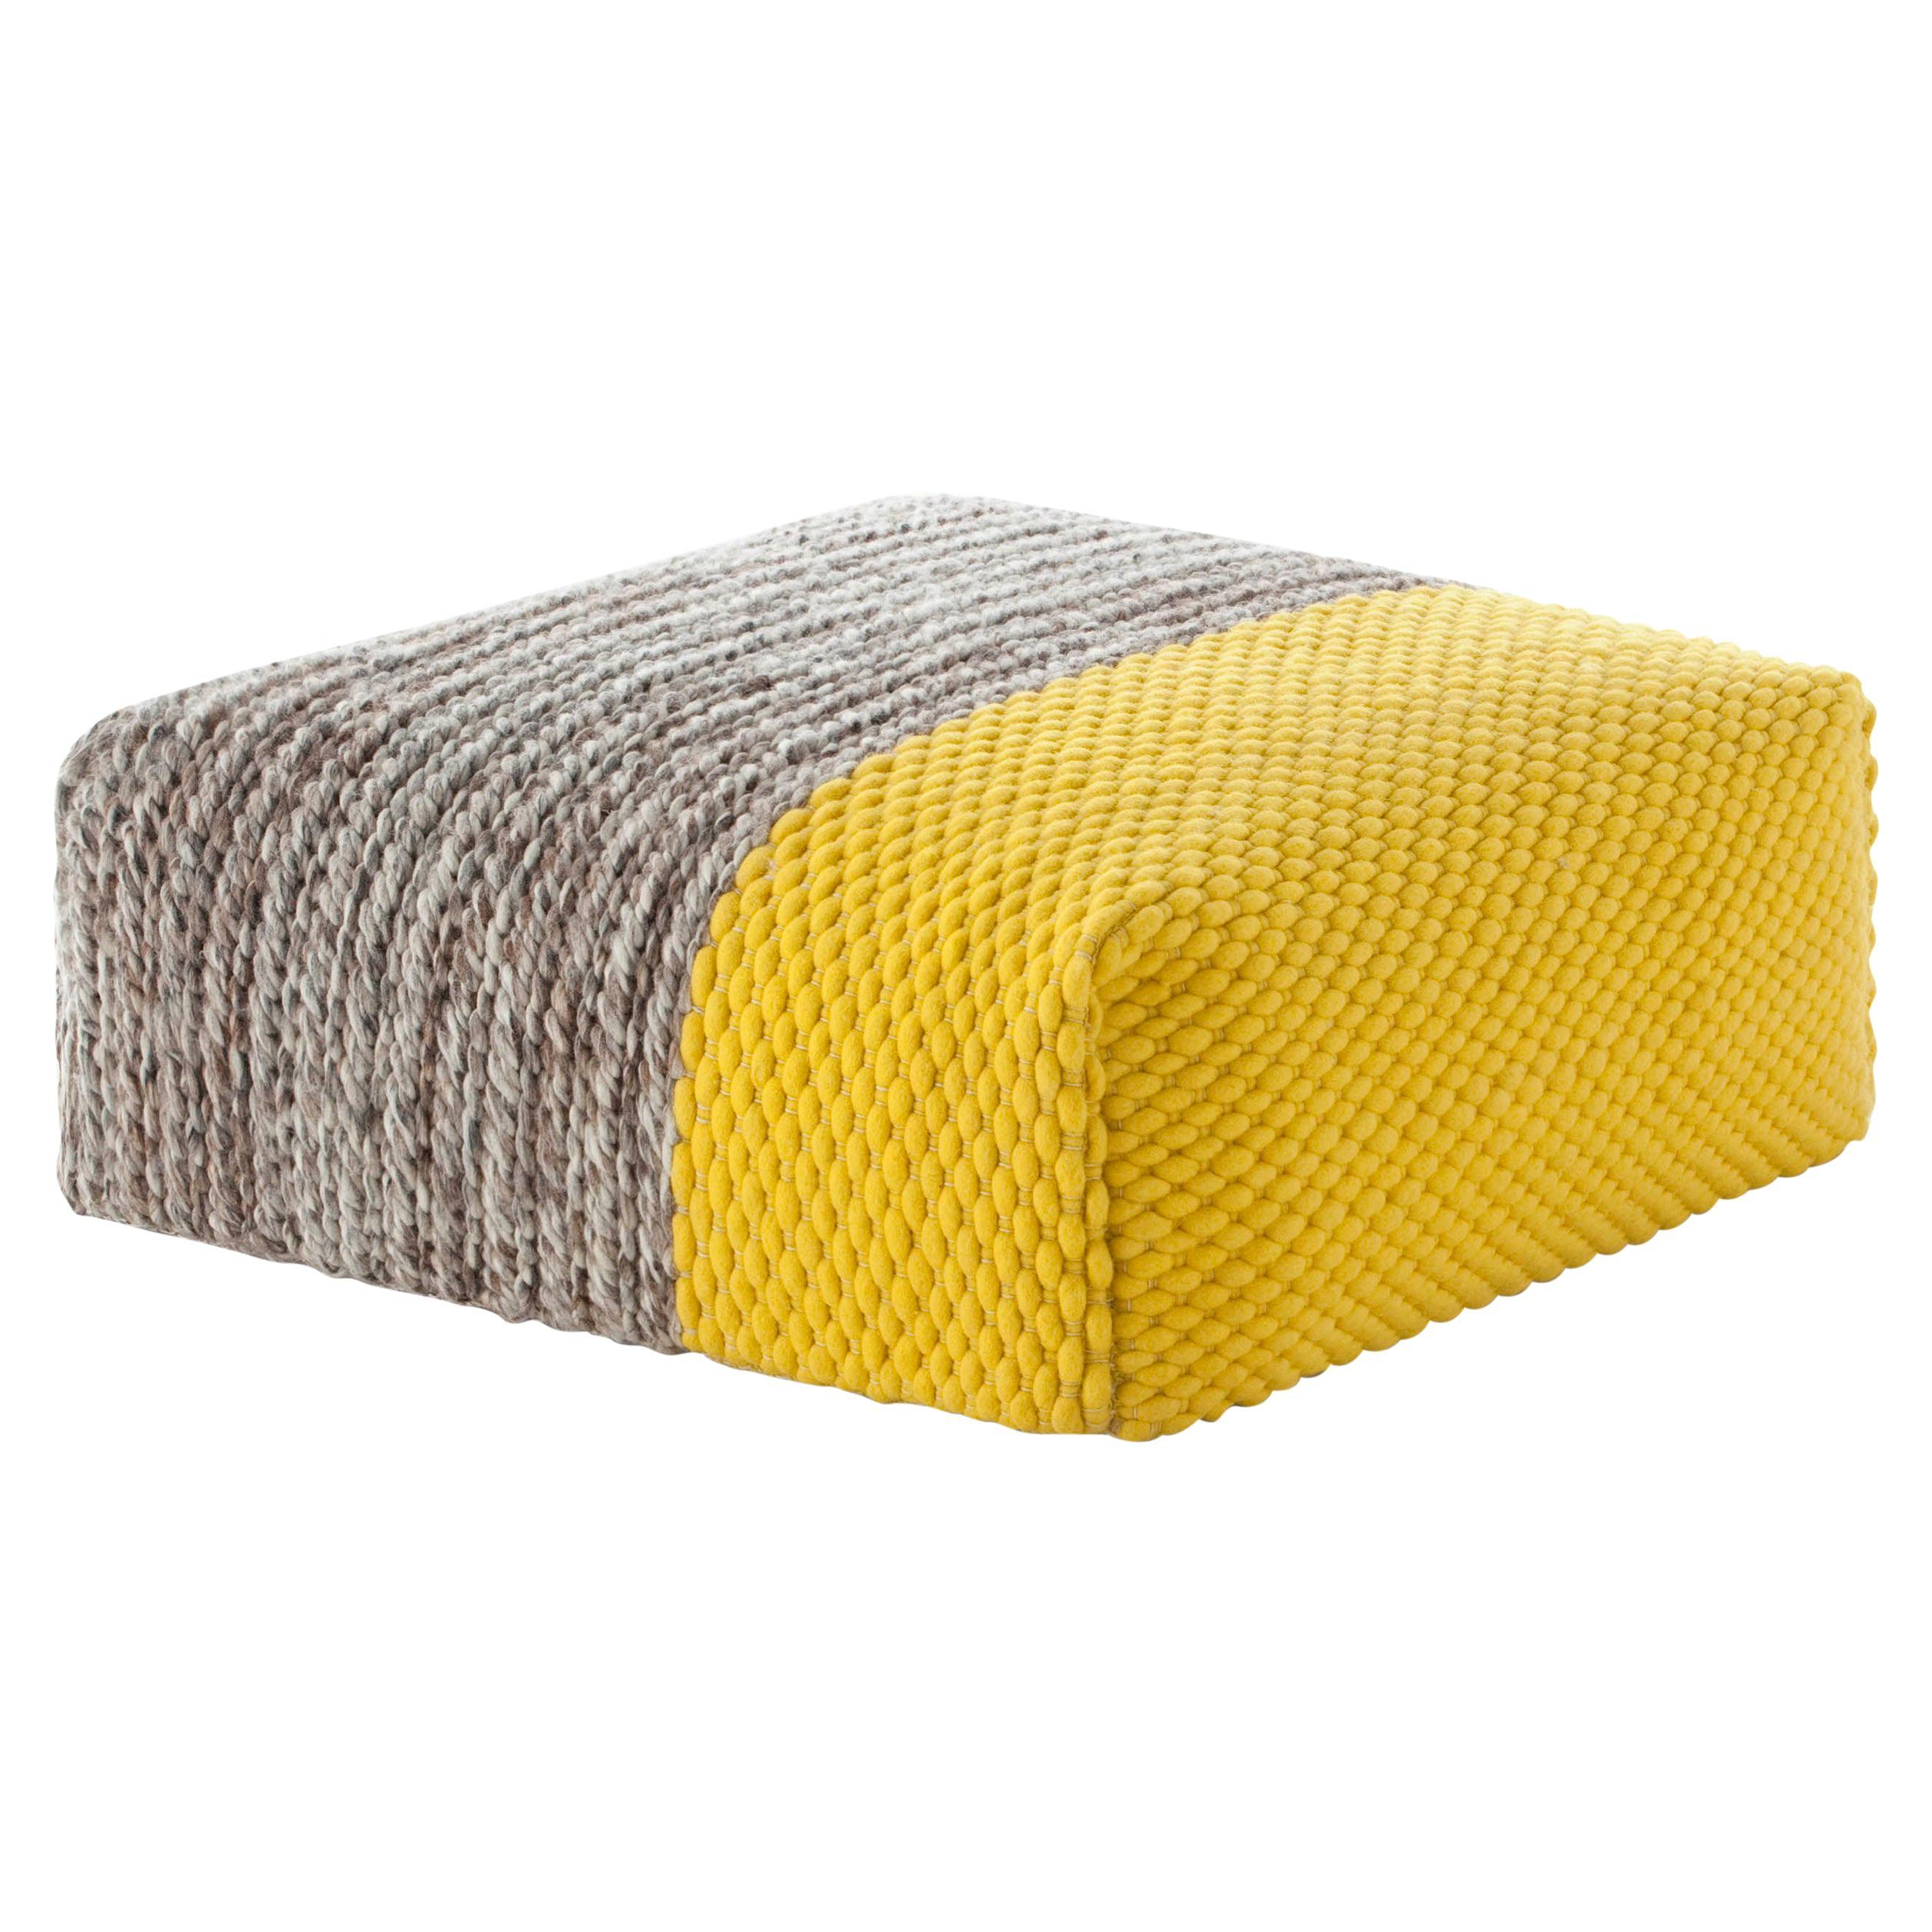 GAN Mangas Space Square Pouf Plait in Wool